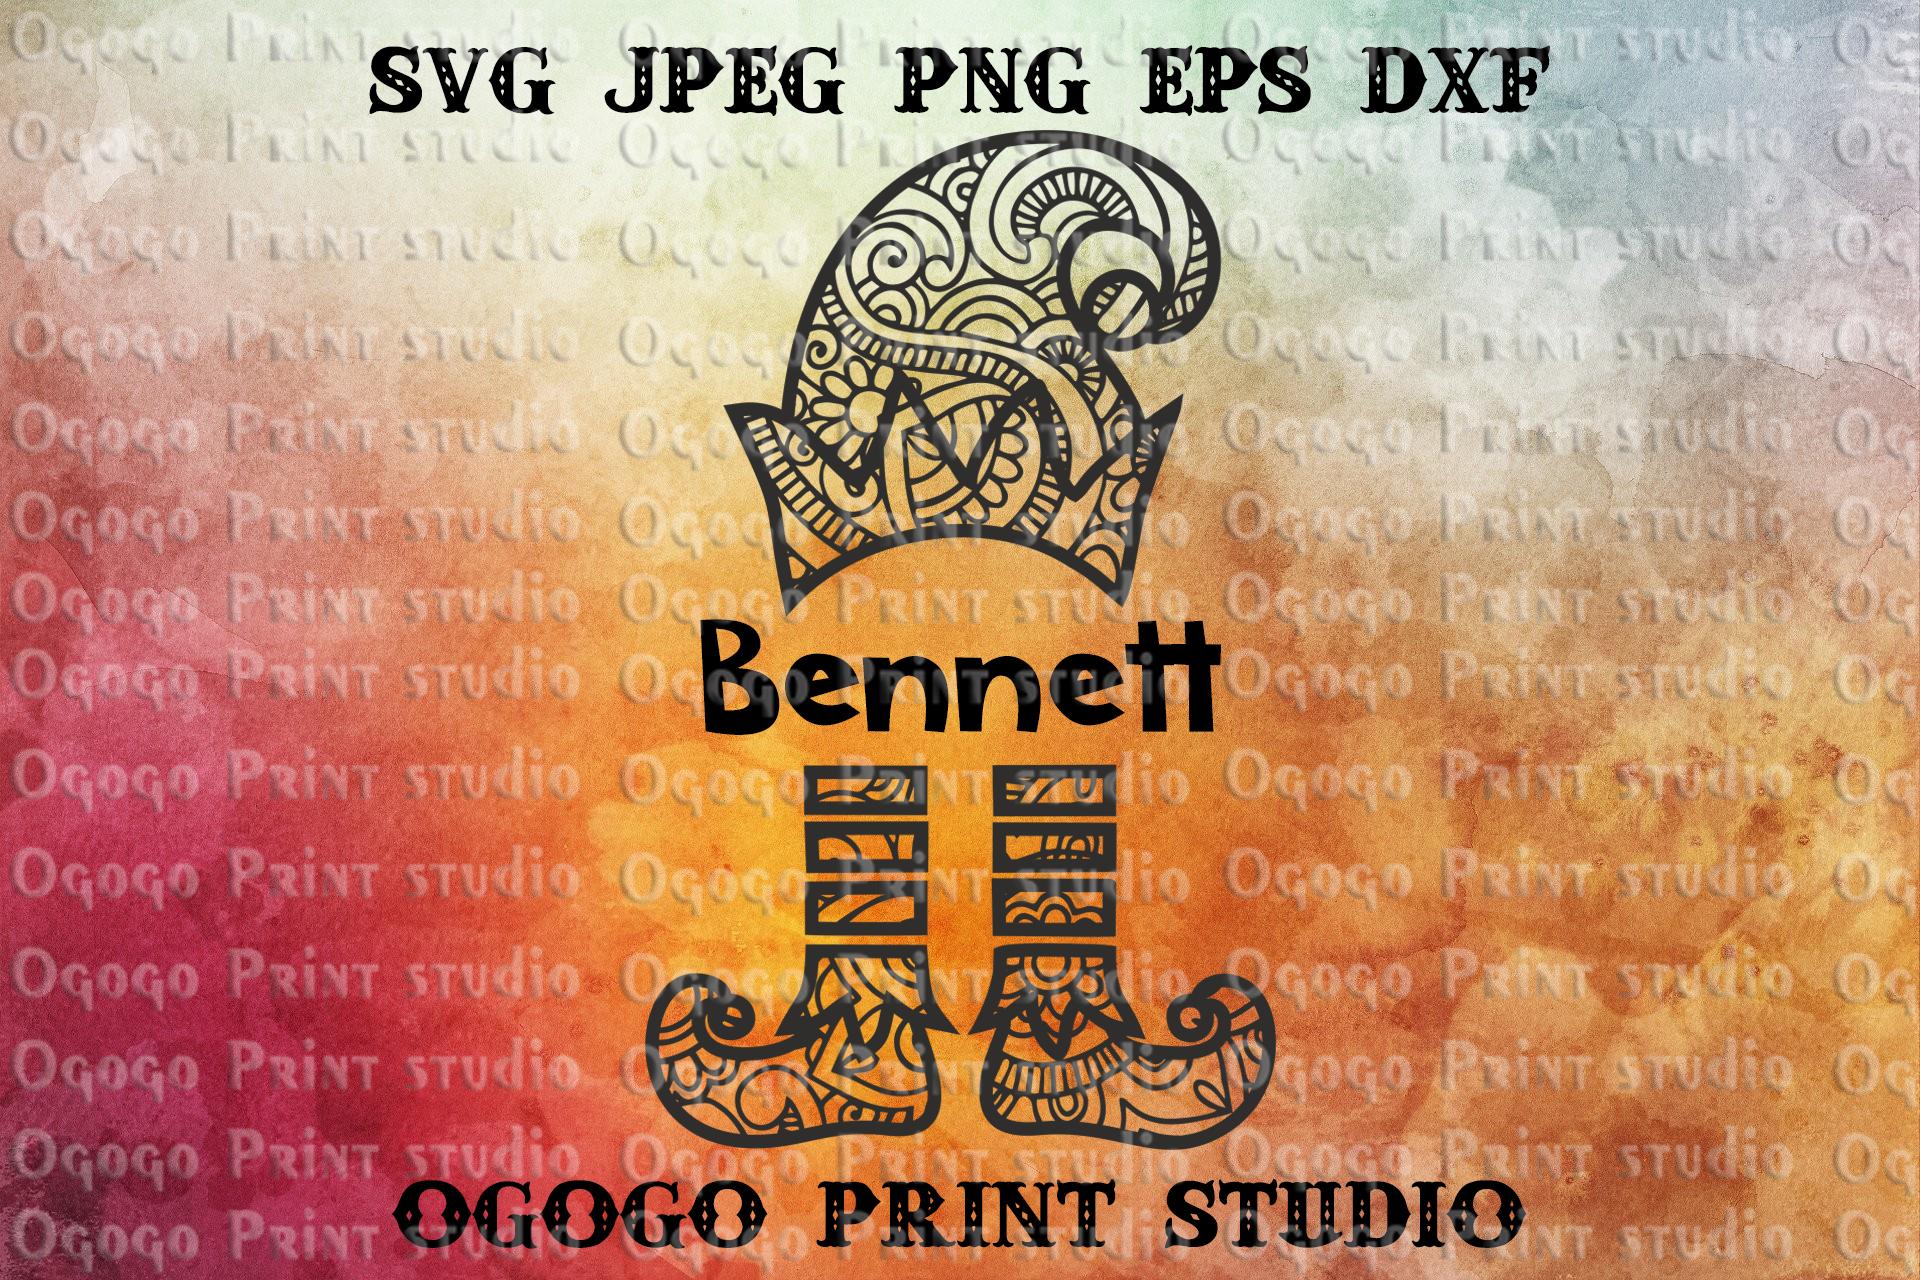 Elf svg, Christmas svg, hristmas SVG, Zentangle SVG, Mandala example image 1